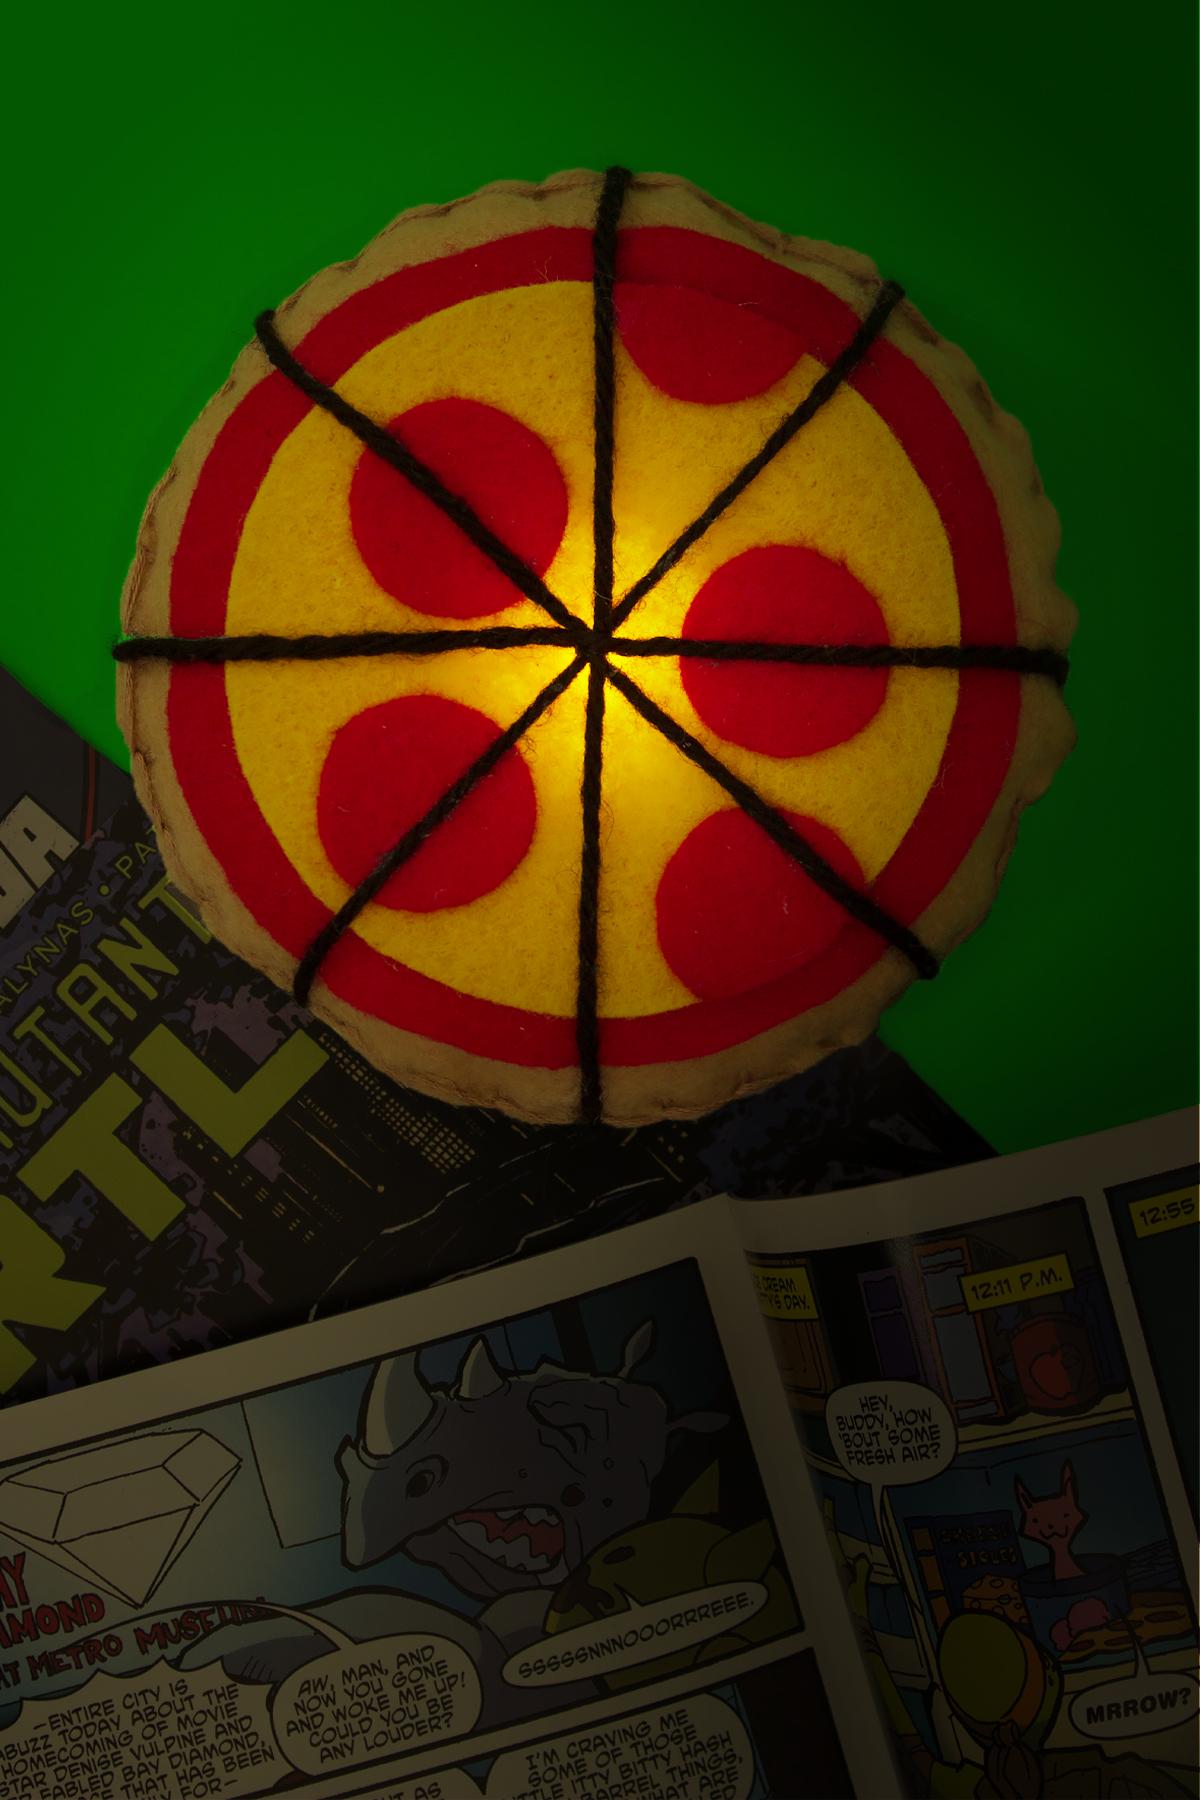 TMNT Pizza and SpongeBob Patrick Night Light Crafts